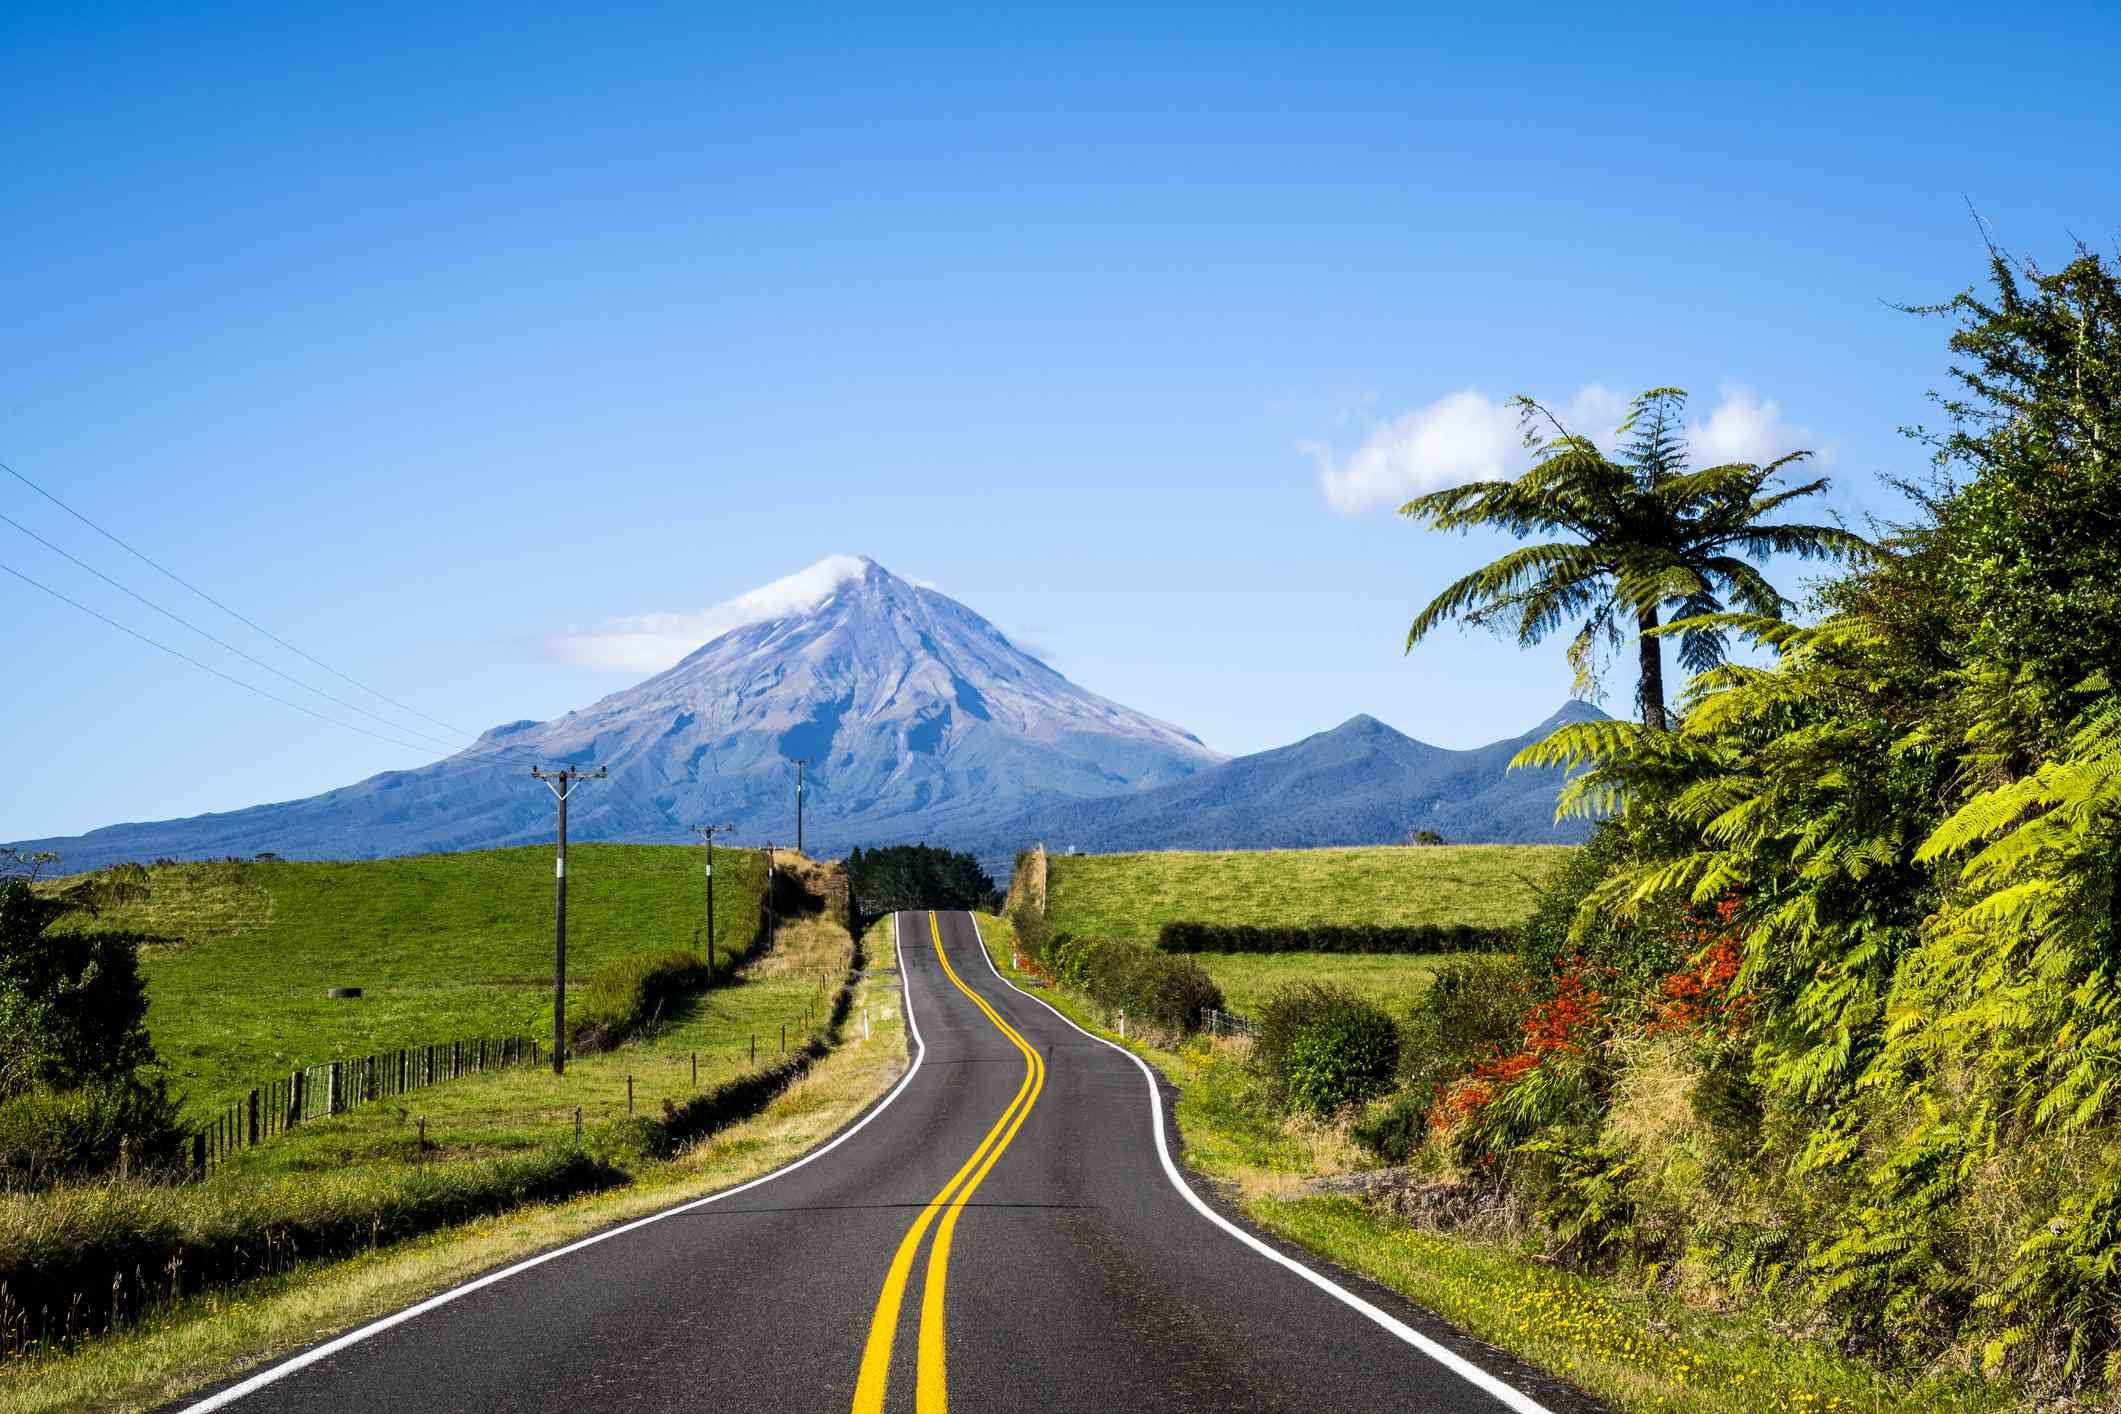 Scenic view of mount Taranaki in New Zealand